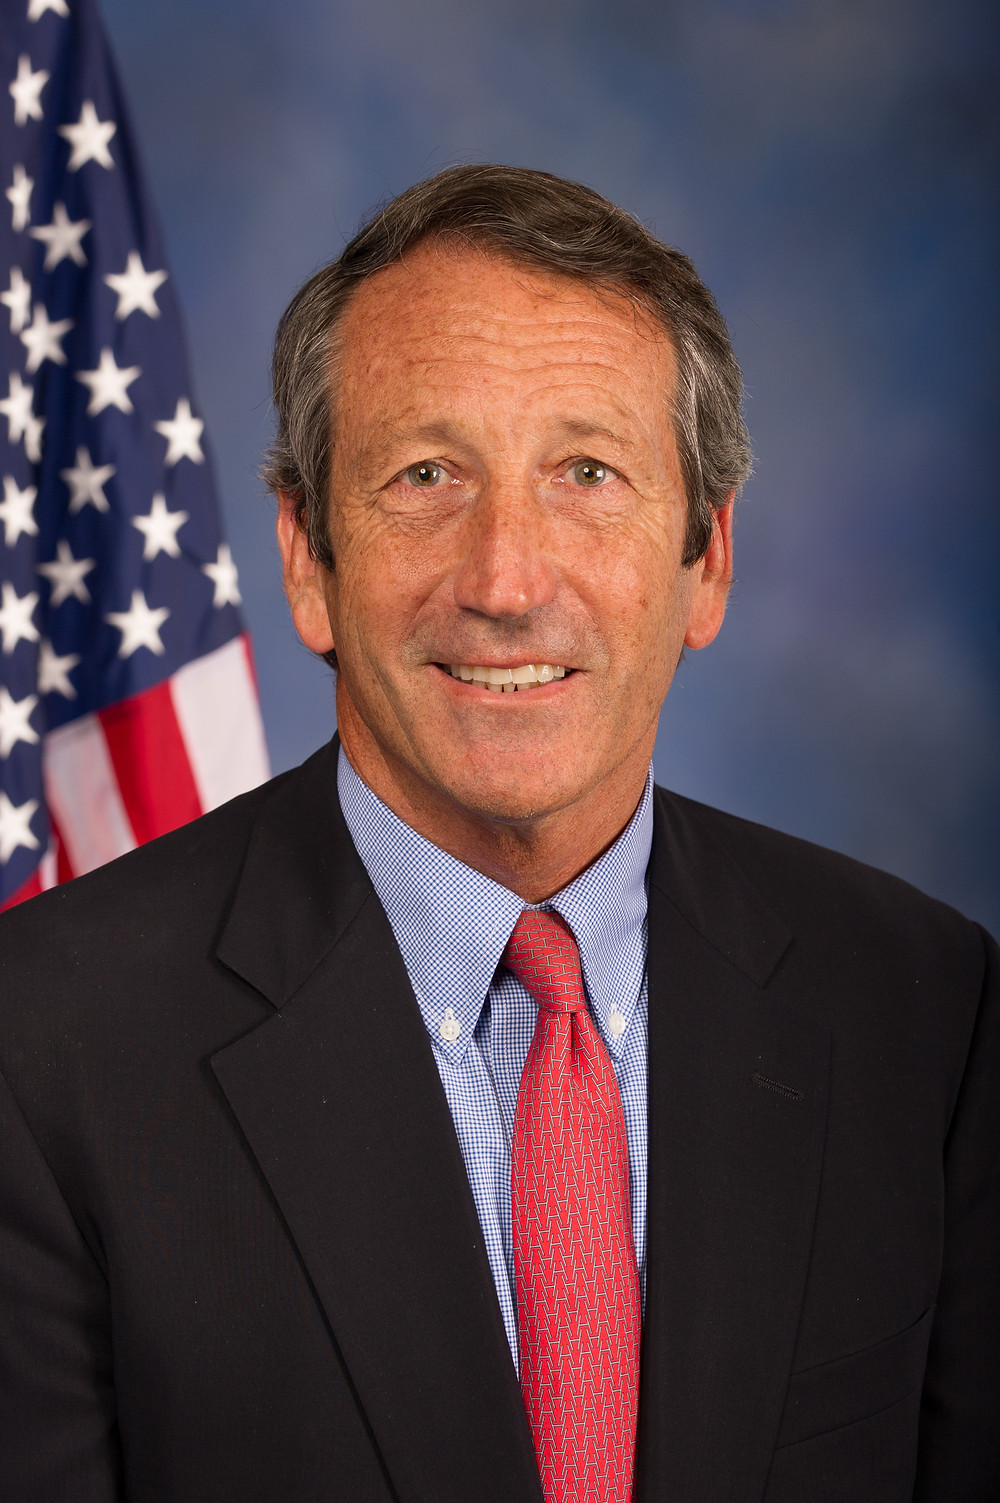 Mark Sanford, Rep. Presidential Candidate